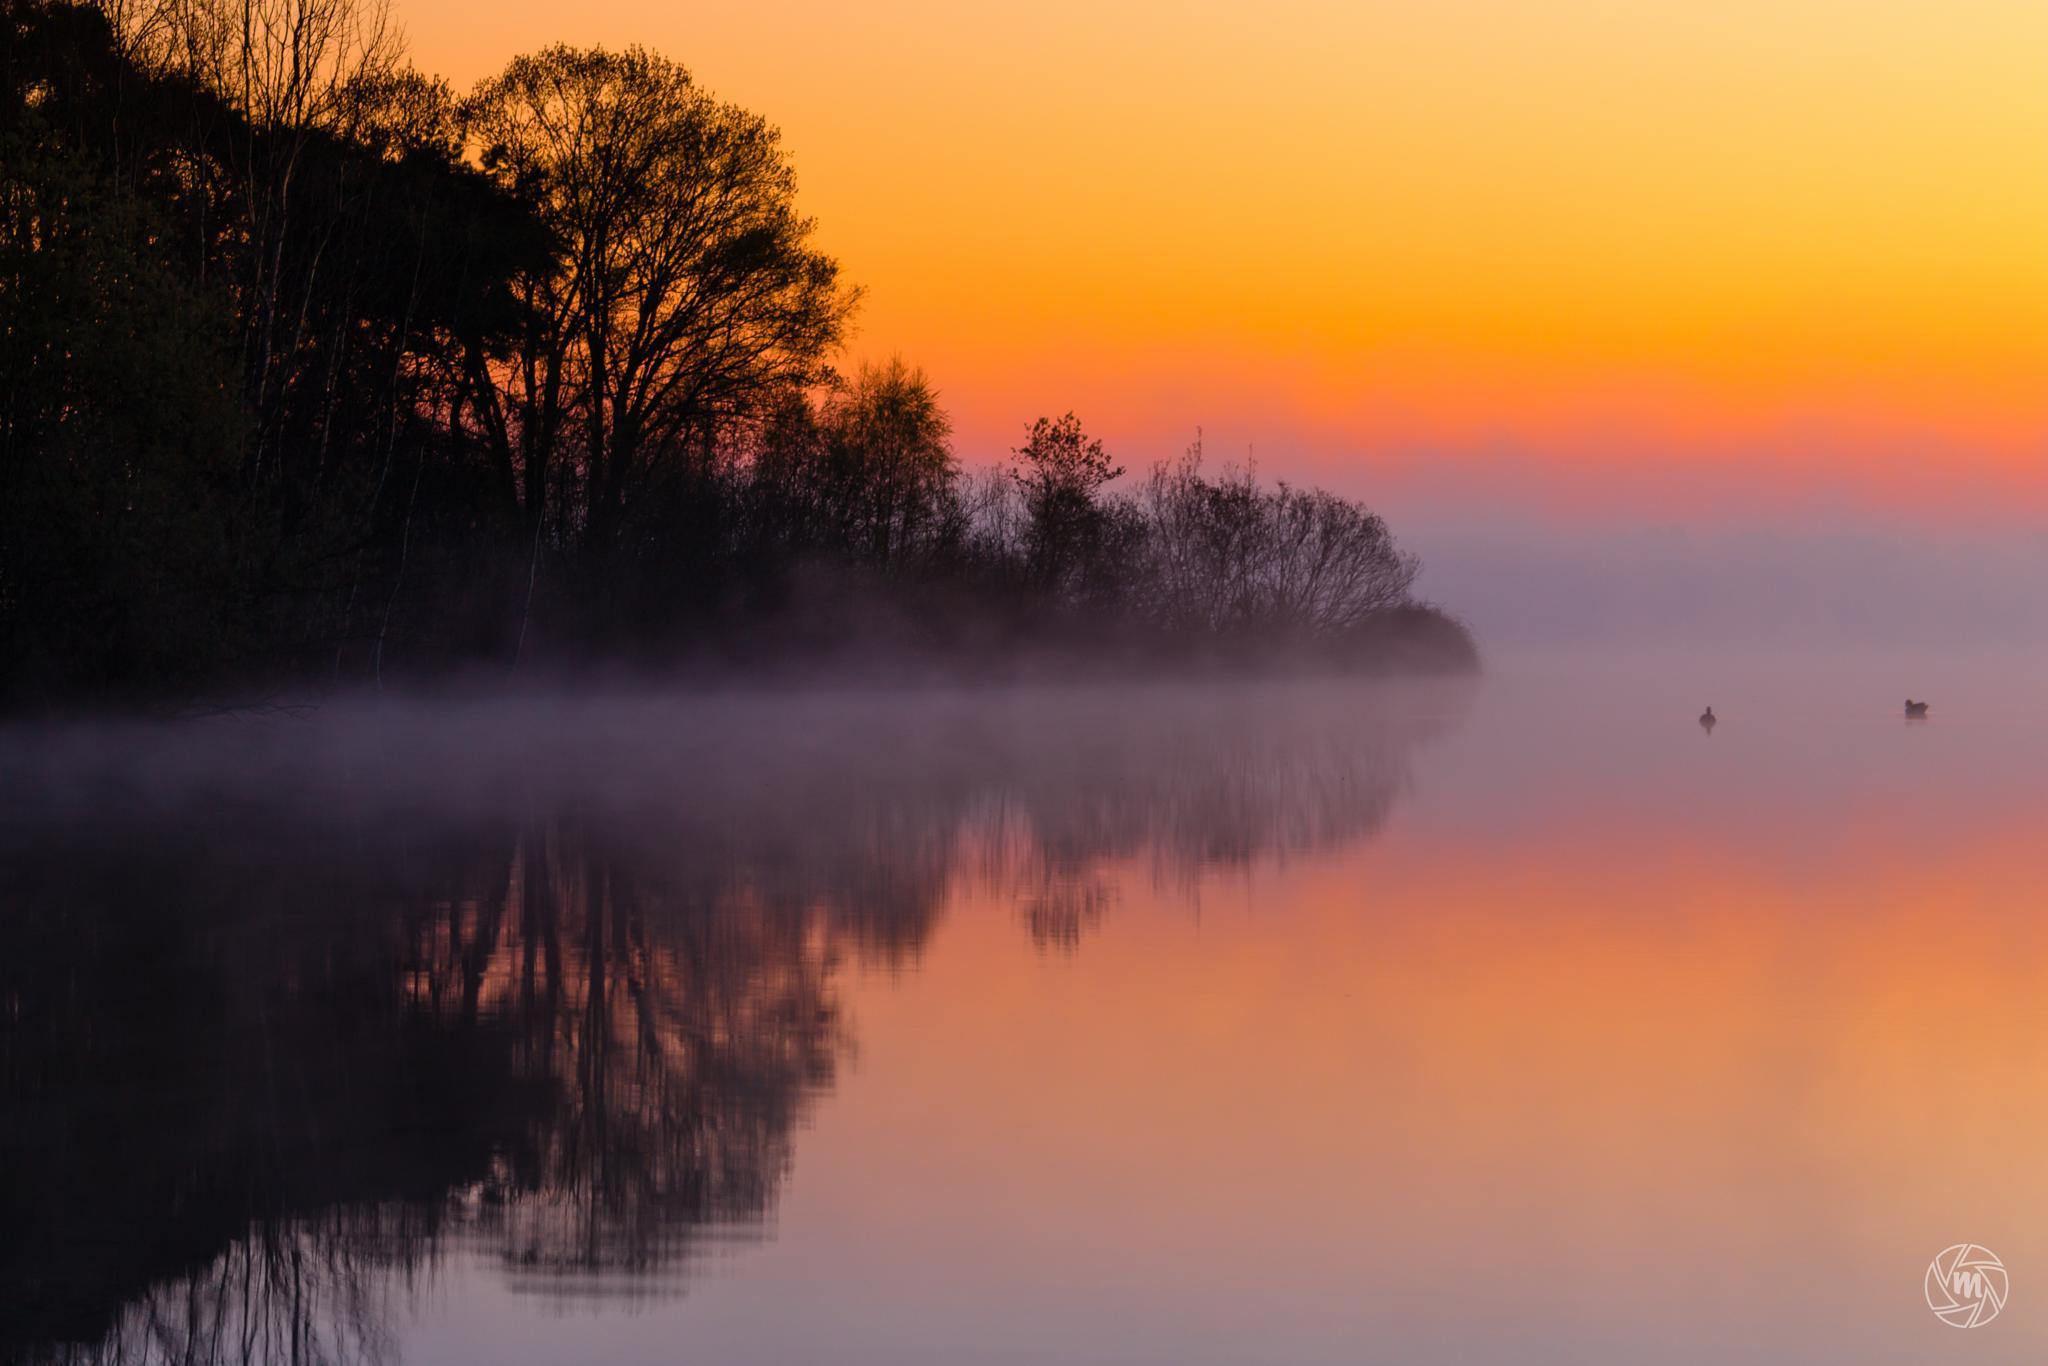 Foggy Sunrise Reflections by William Mevissen